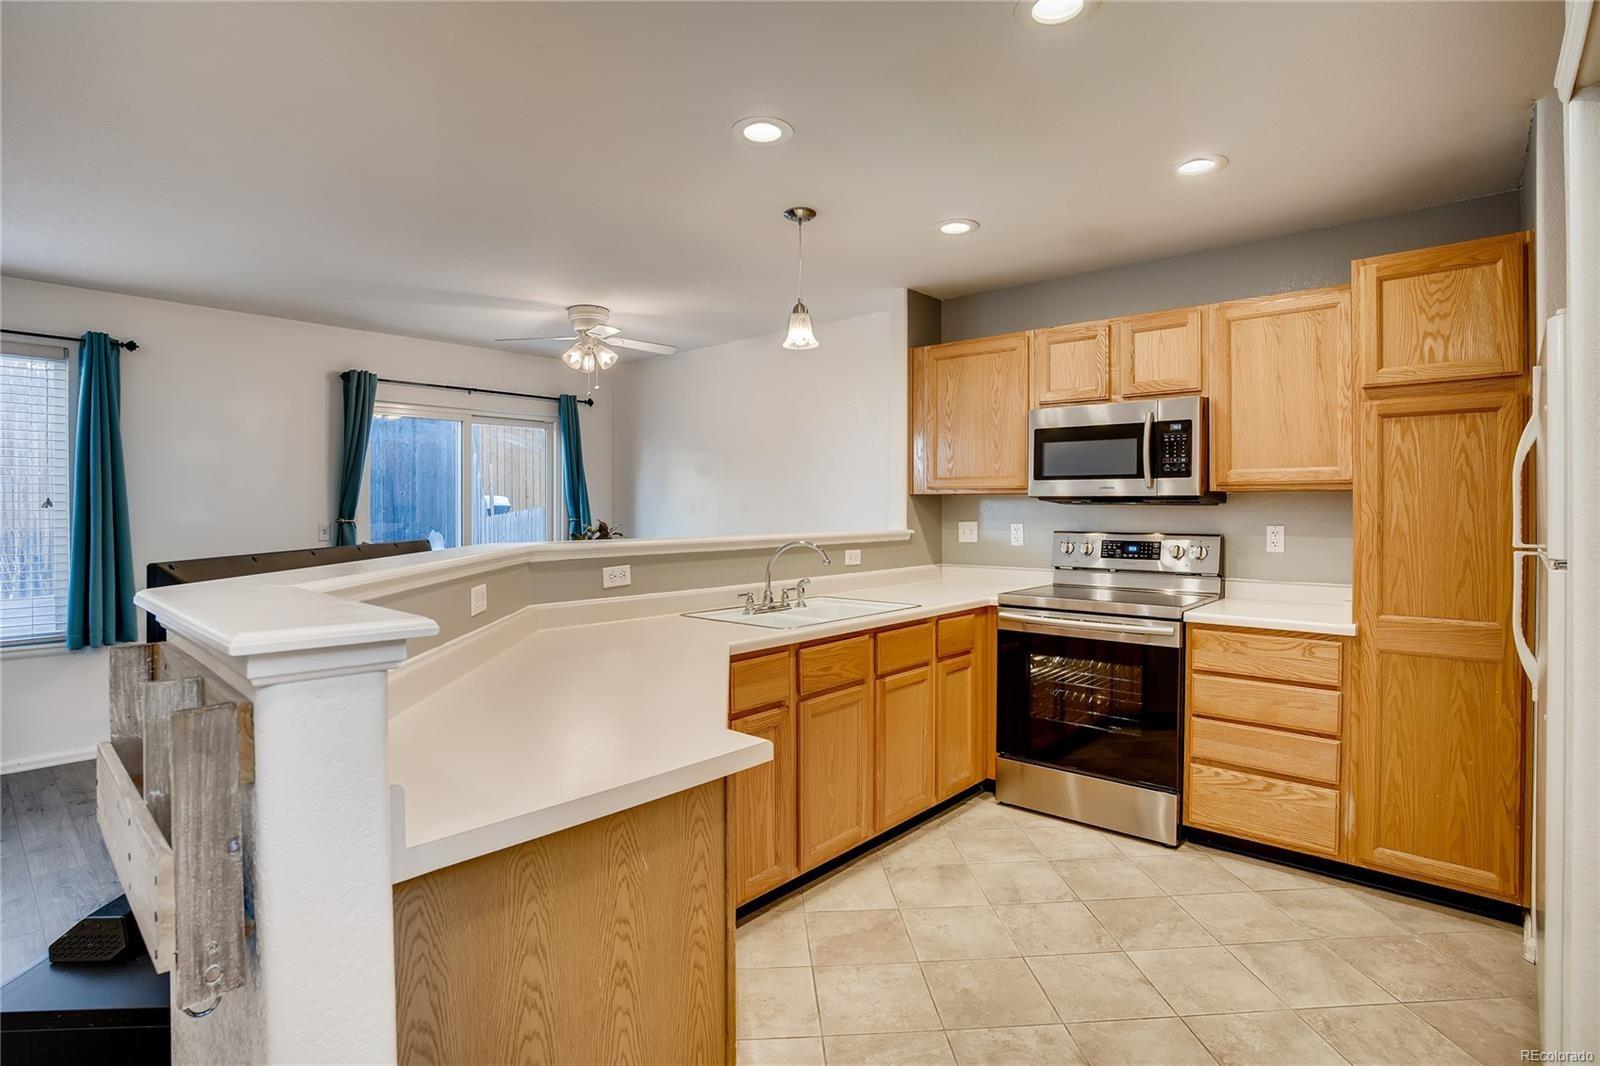 MLS# 3654588 - 5 - 2085 E 103rd Avenue, Thornton, CO 80229